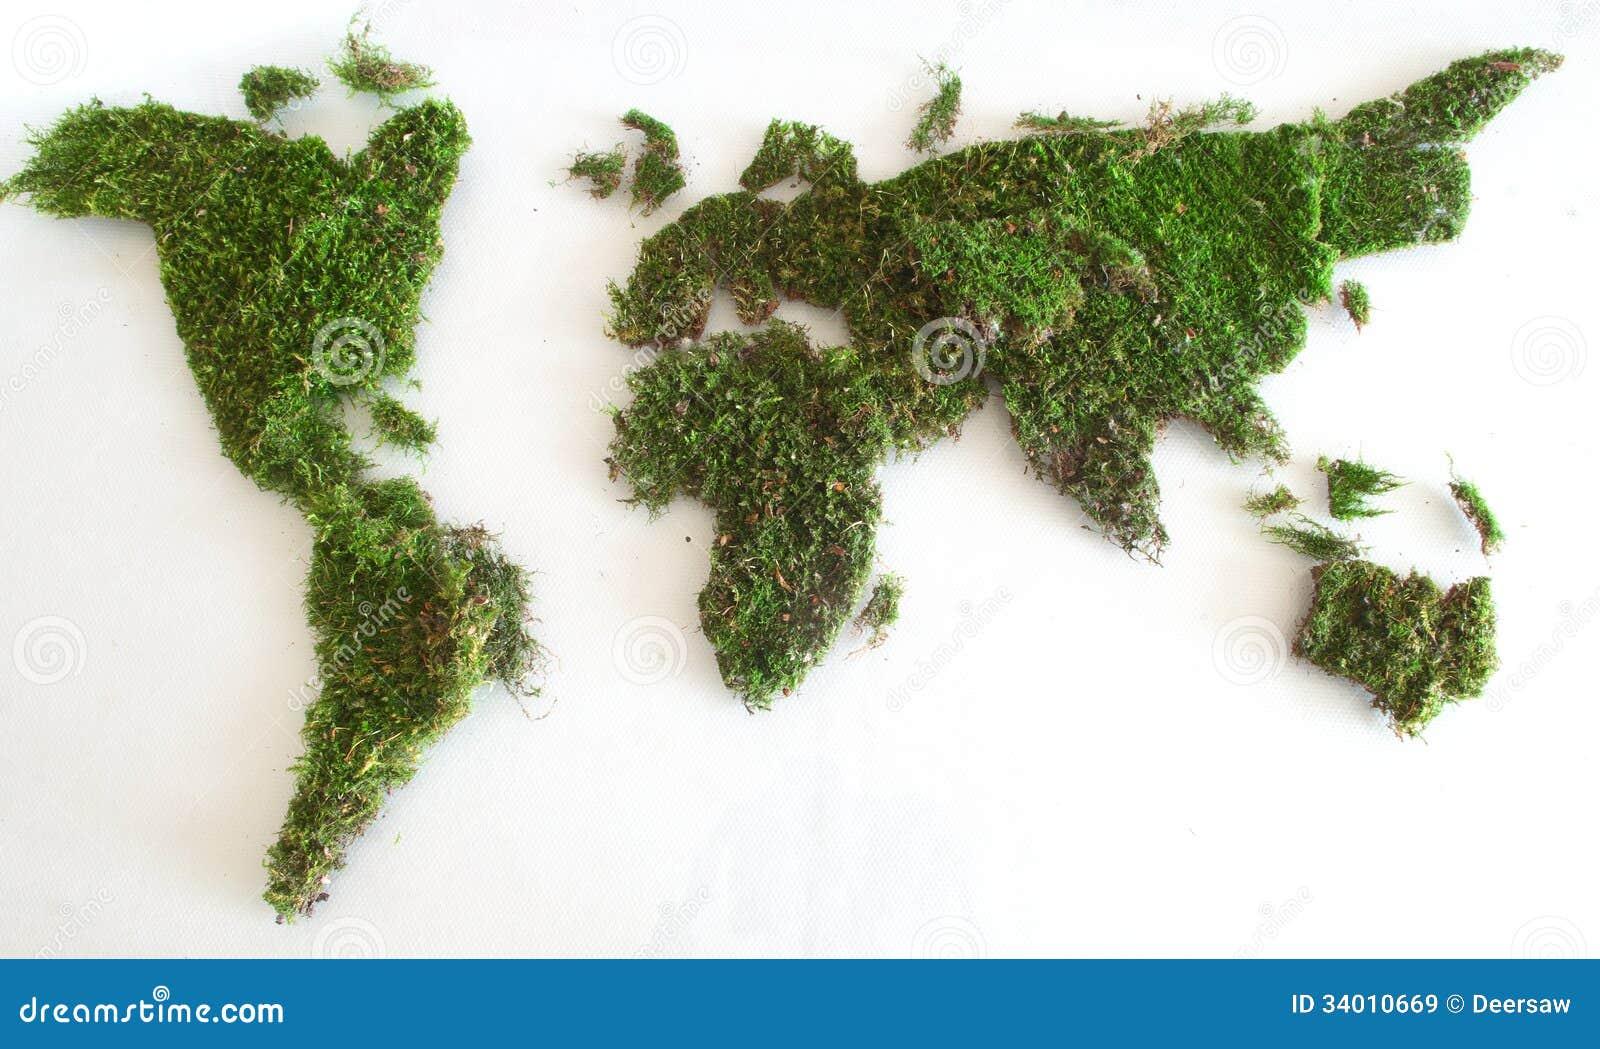 Green world map stock illustration illustration of graphic 29392928 green world map royalty free stock images gumiabroncs Images